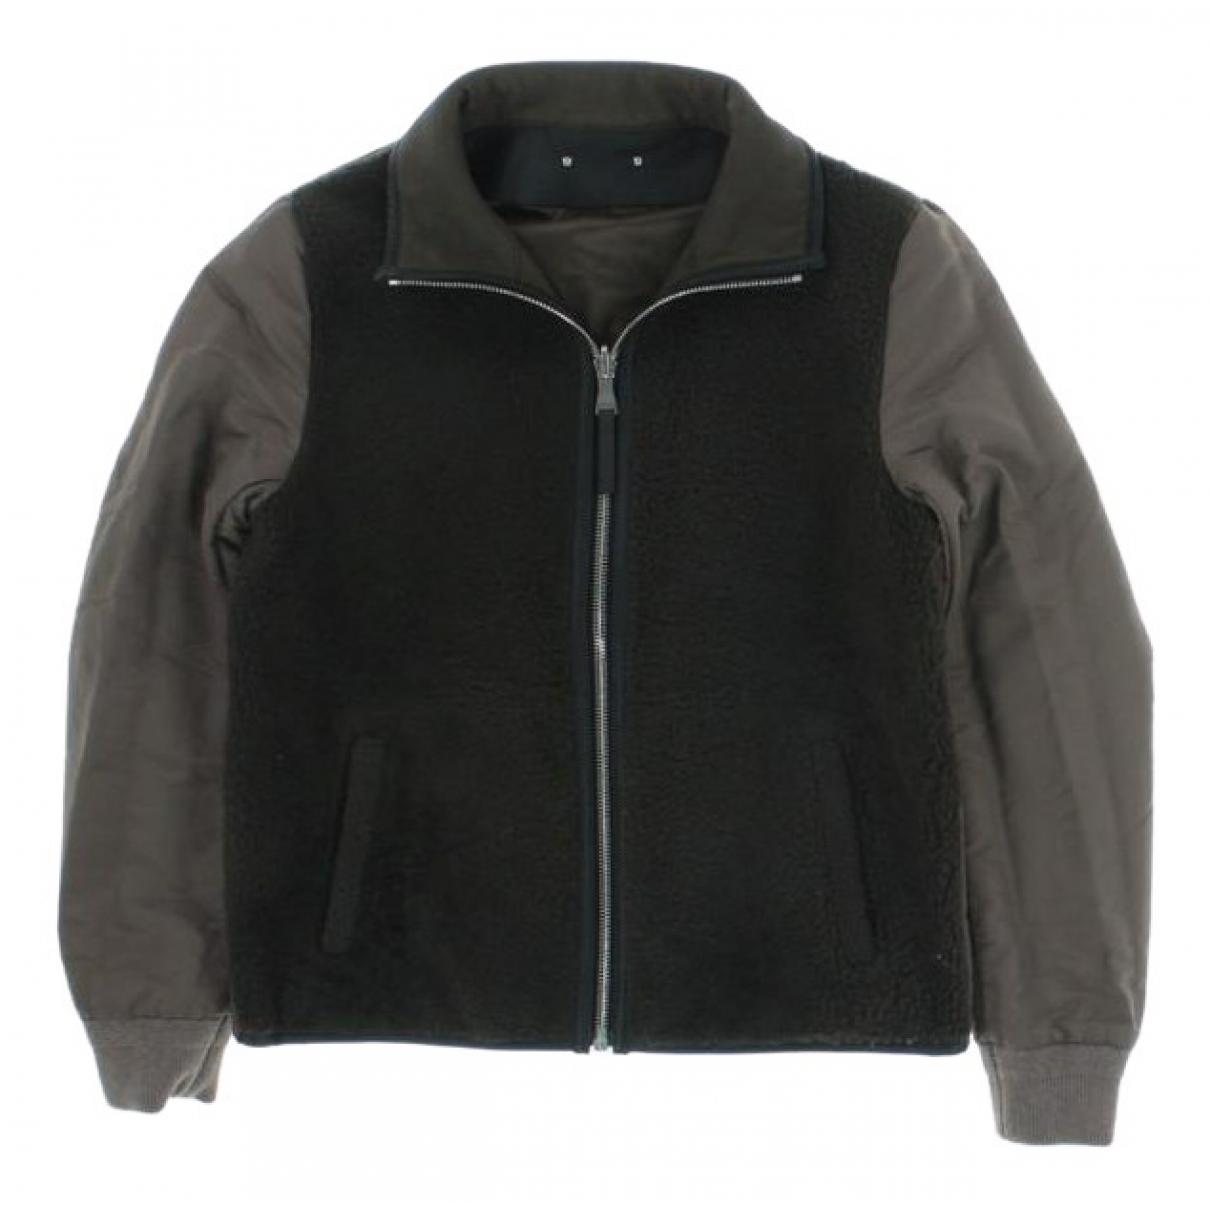 Louis Vuitton \N Jacke in  Khaki Schaf